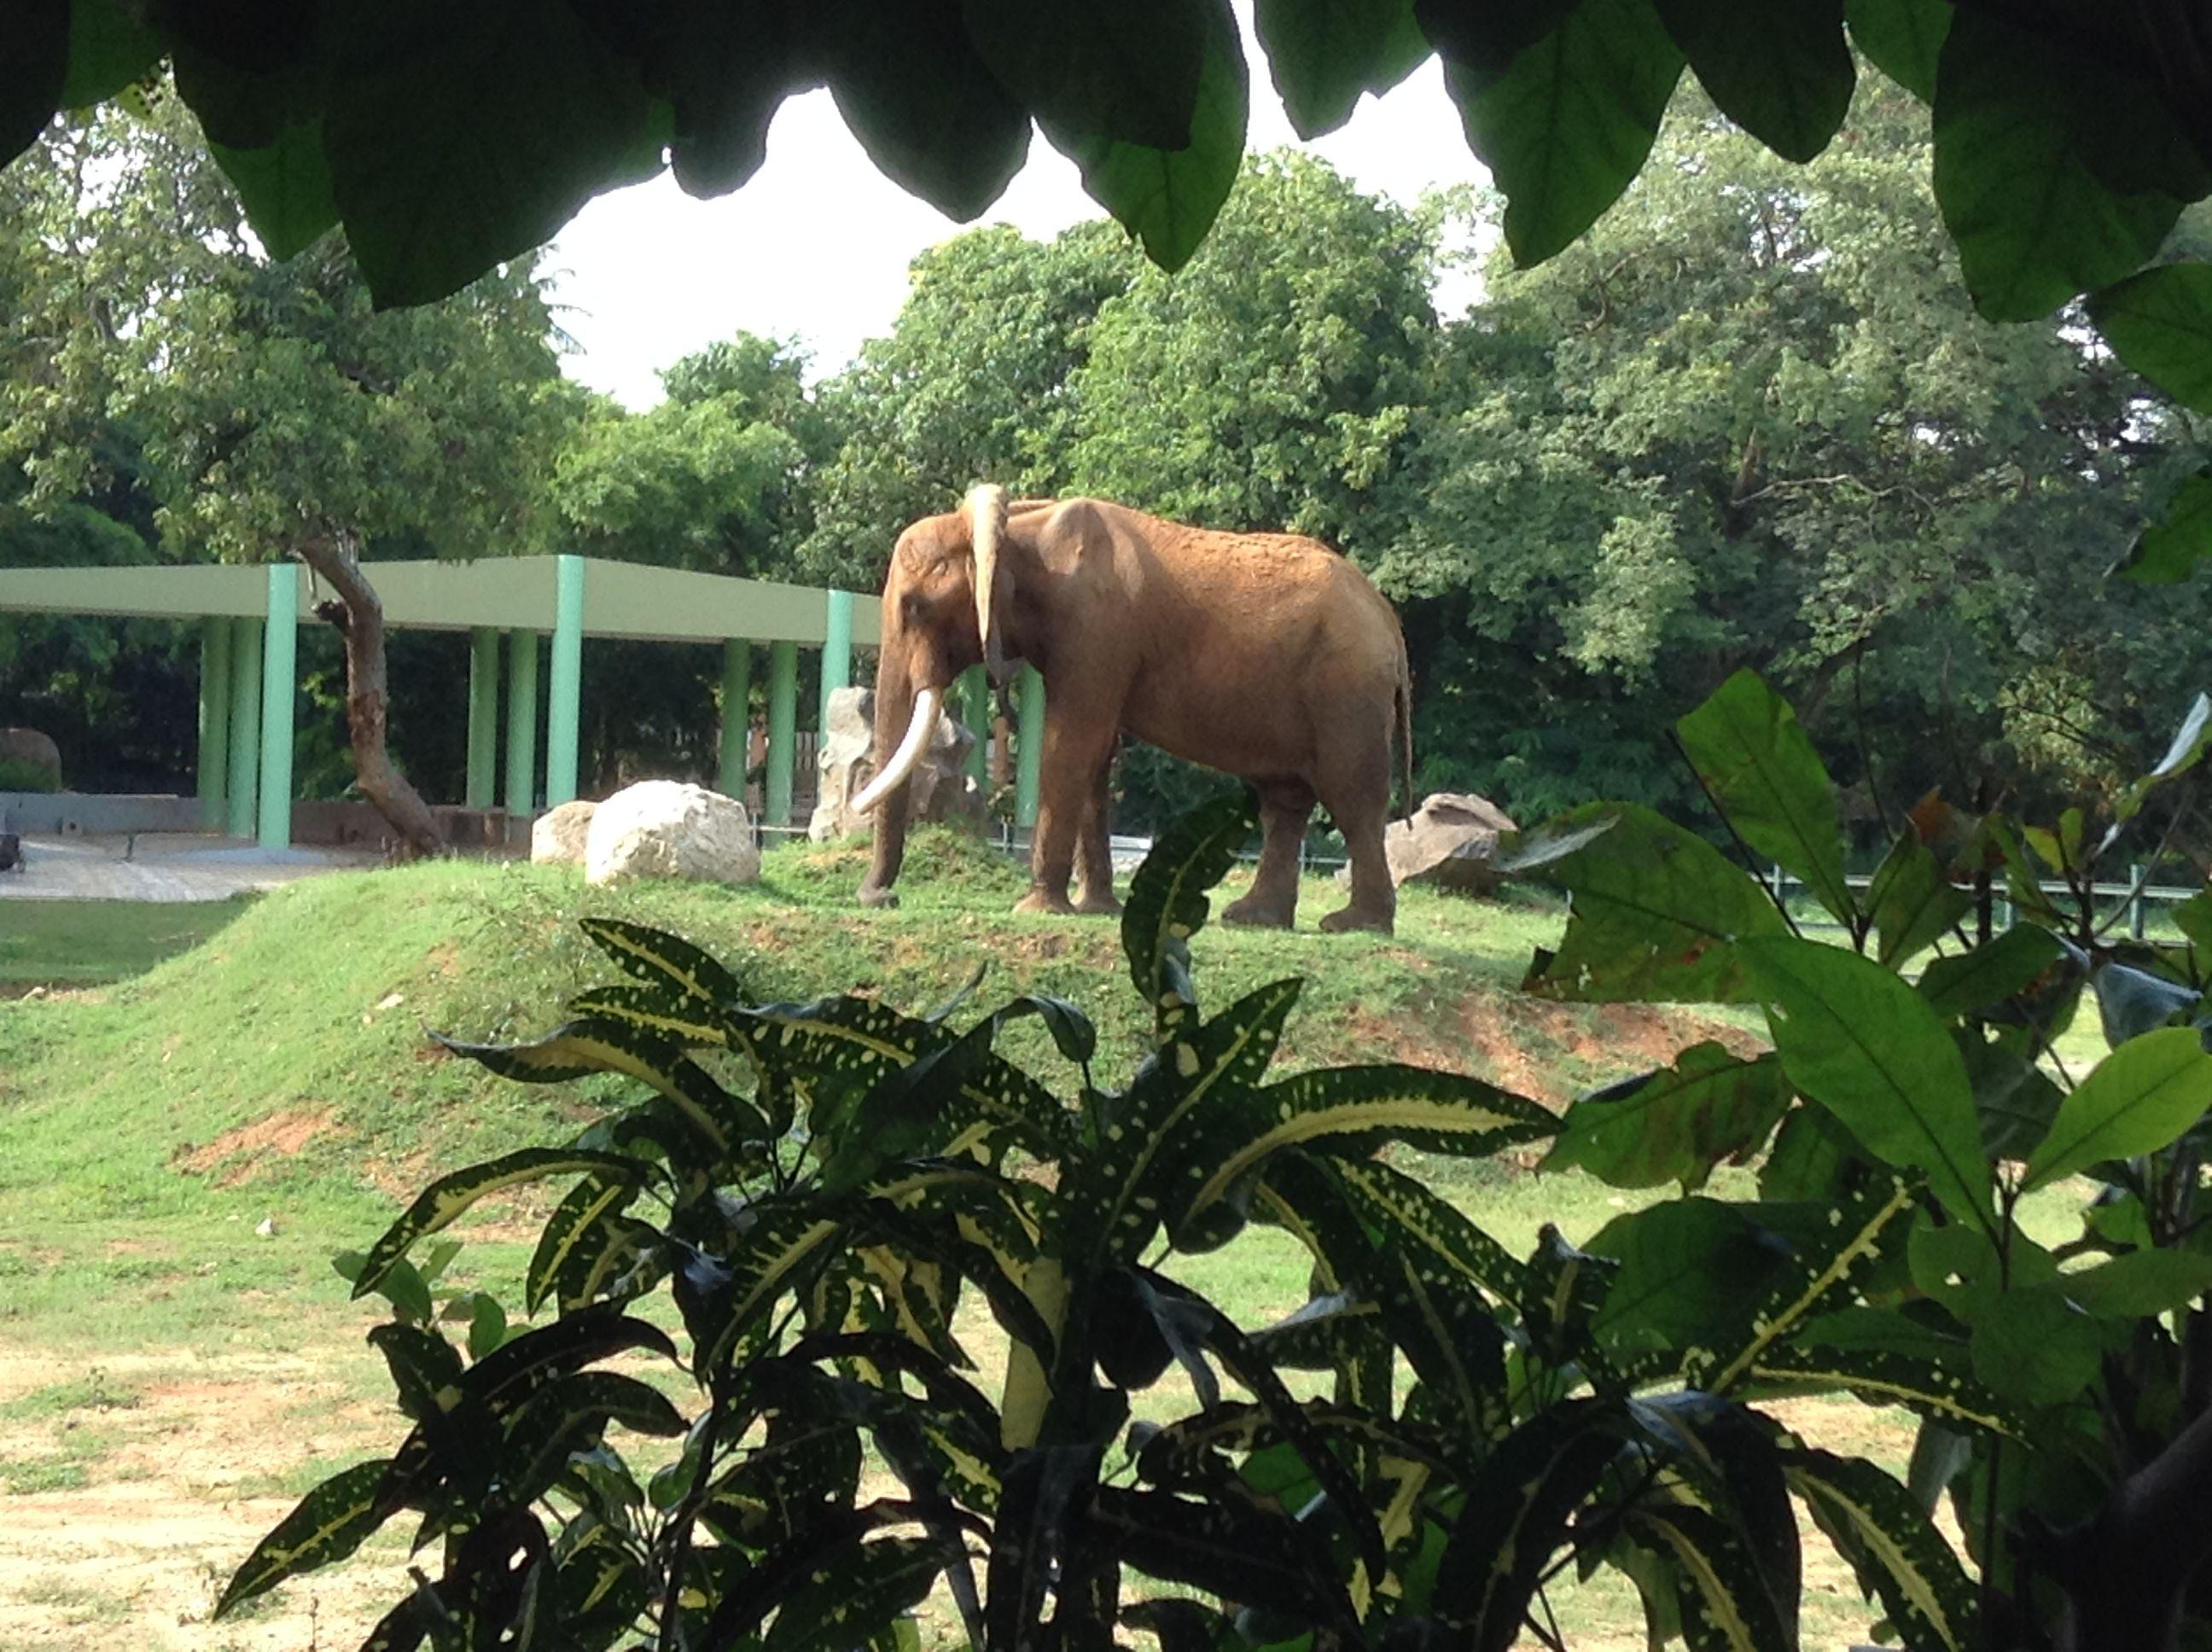 21c962107dec3bdbe6fd591b8ee087f2 - Mysore Zoo Sri Chamarajendra Zoological Gardens